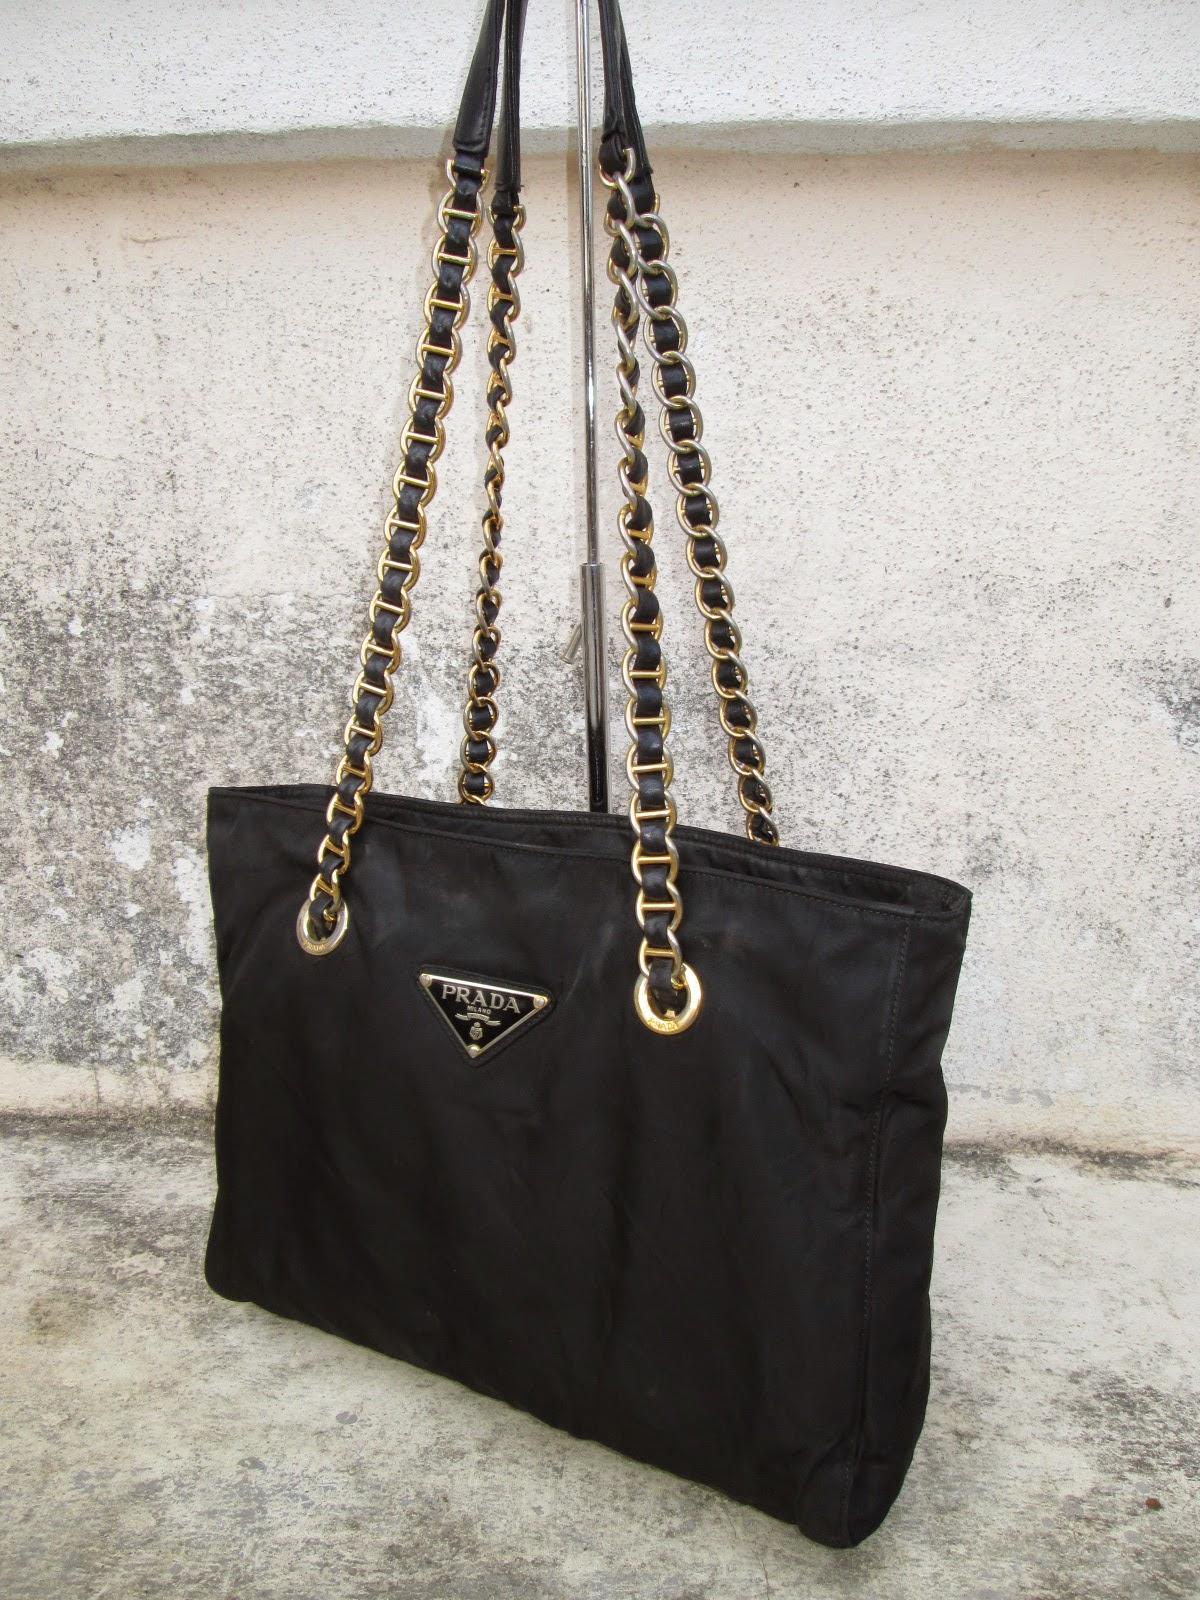 prada luggage price - d0rayakEEbaG: Authentic PRADA Logos Quilted Chain Shoulder Bag(SOLD)